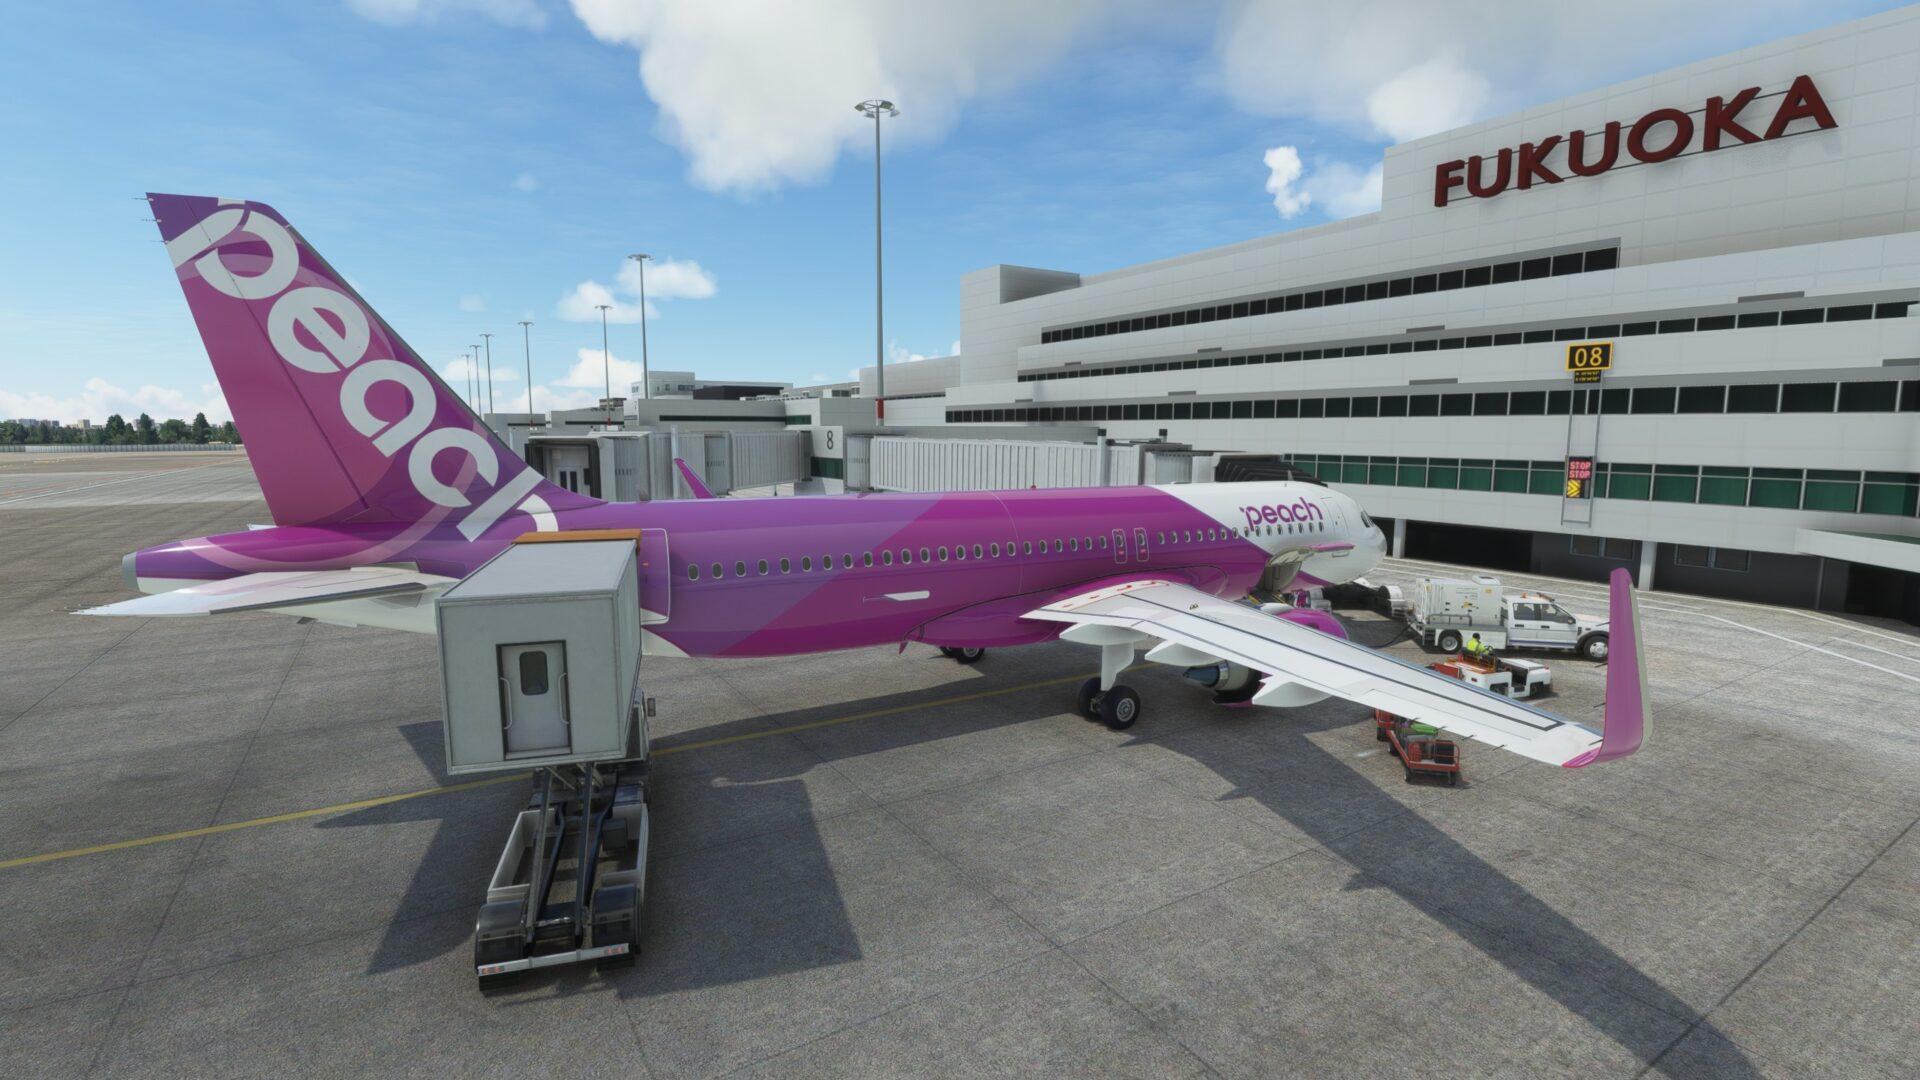 Microsoft Flight Simulator Fukuoka Review